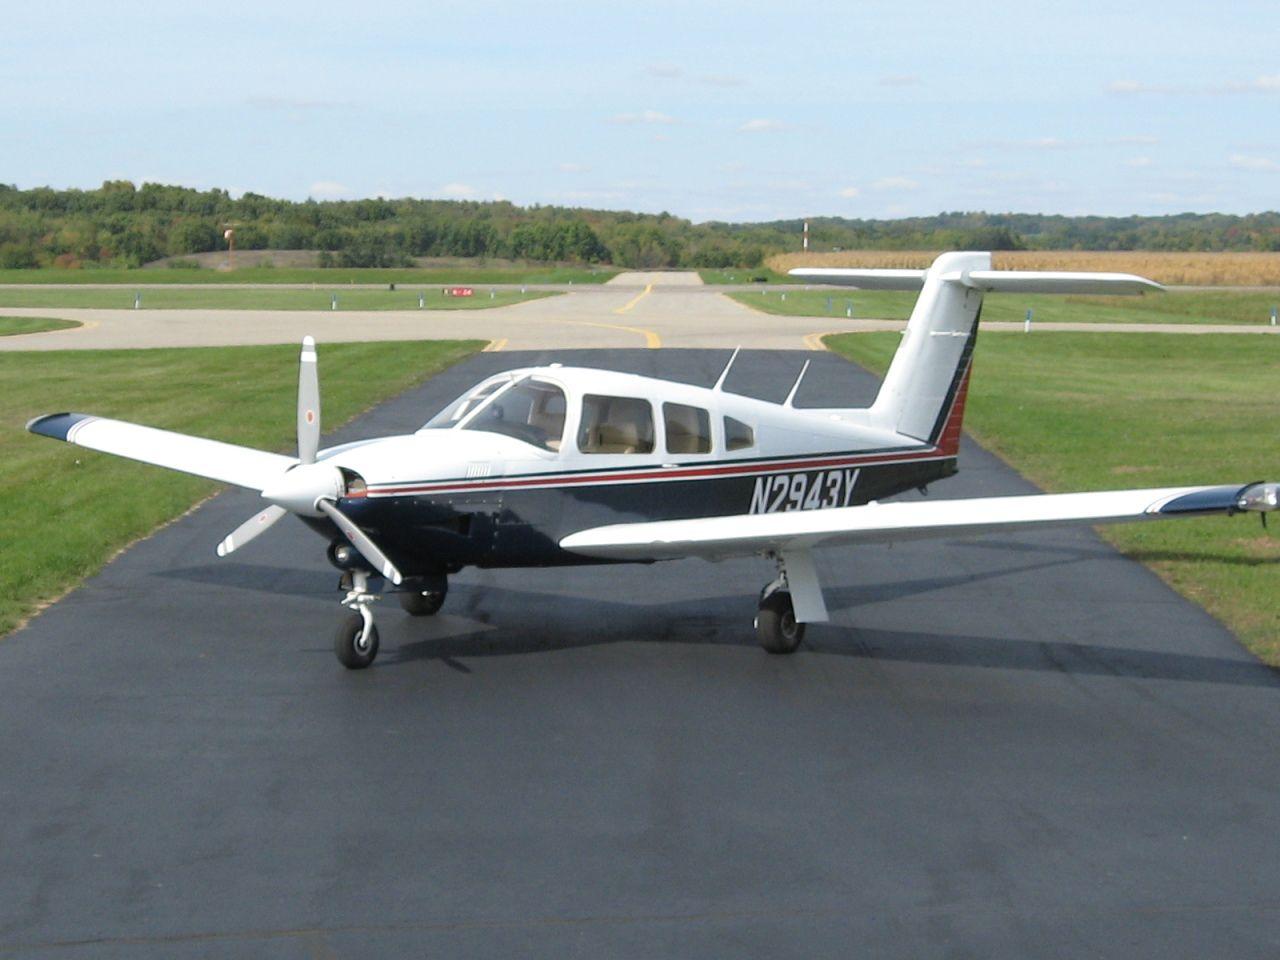 1979 Piper Turbo Arrow Aircraft For Sale Bartelt Aviation Inc Mi Aviacao Aviao